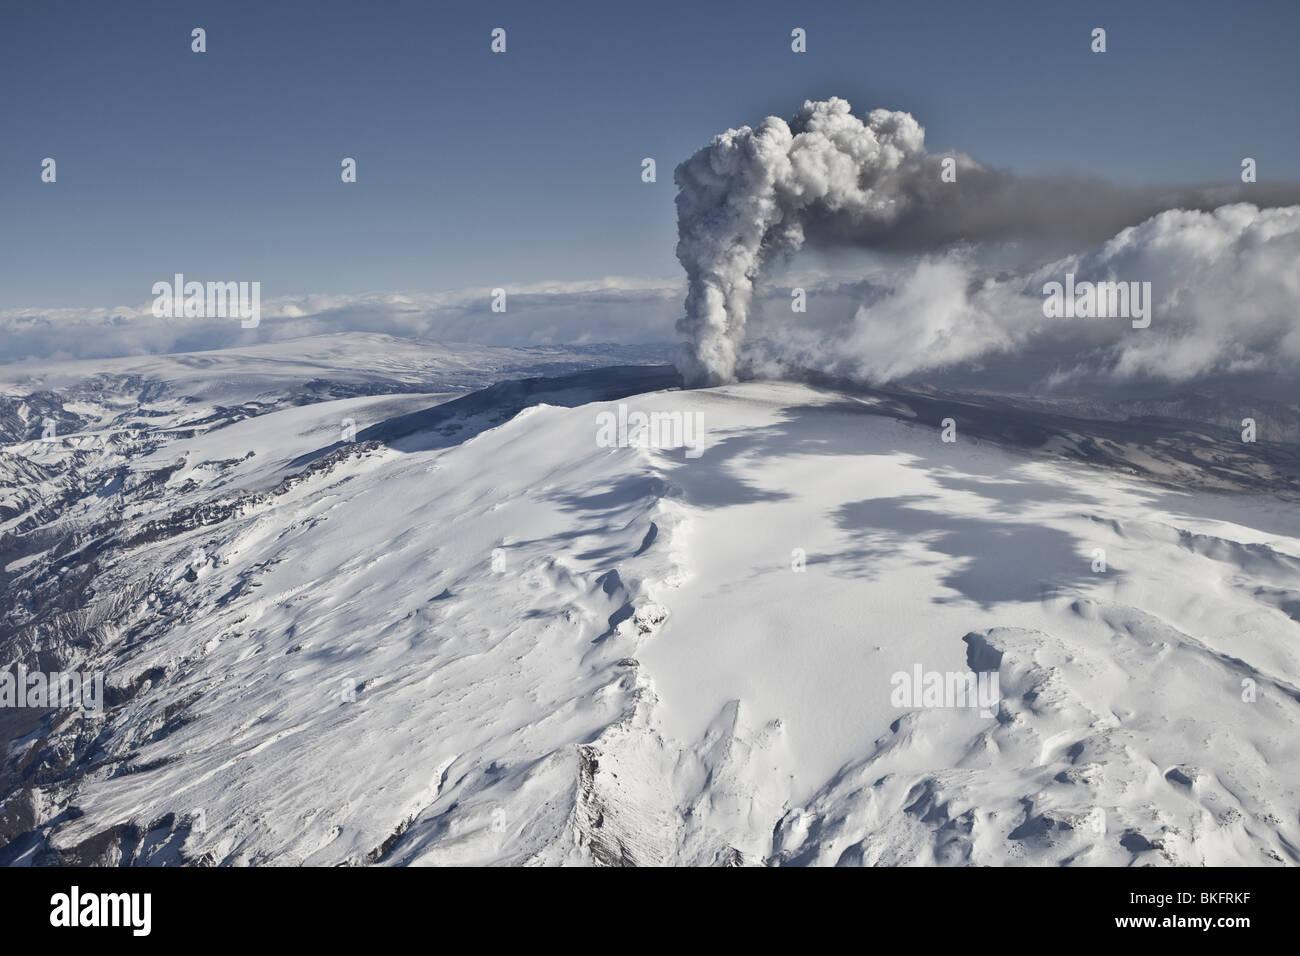 Volcanic Ash Cloud from Eyjafjallajokull Volcano Eruption, Iceland. - Stock Image